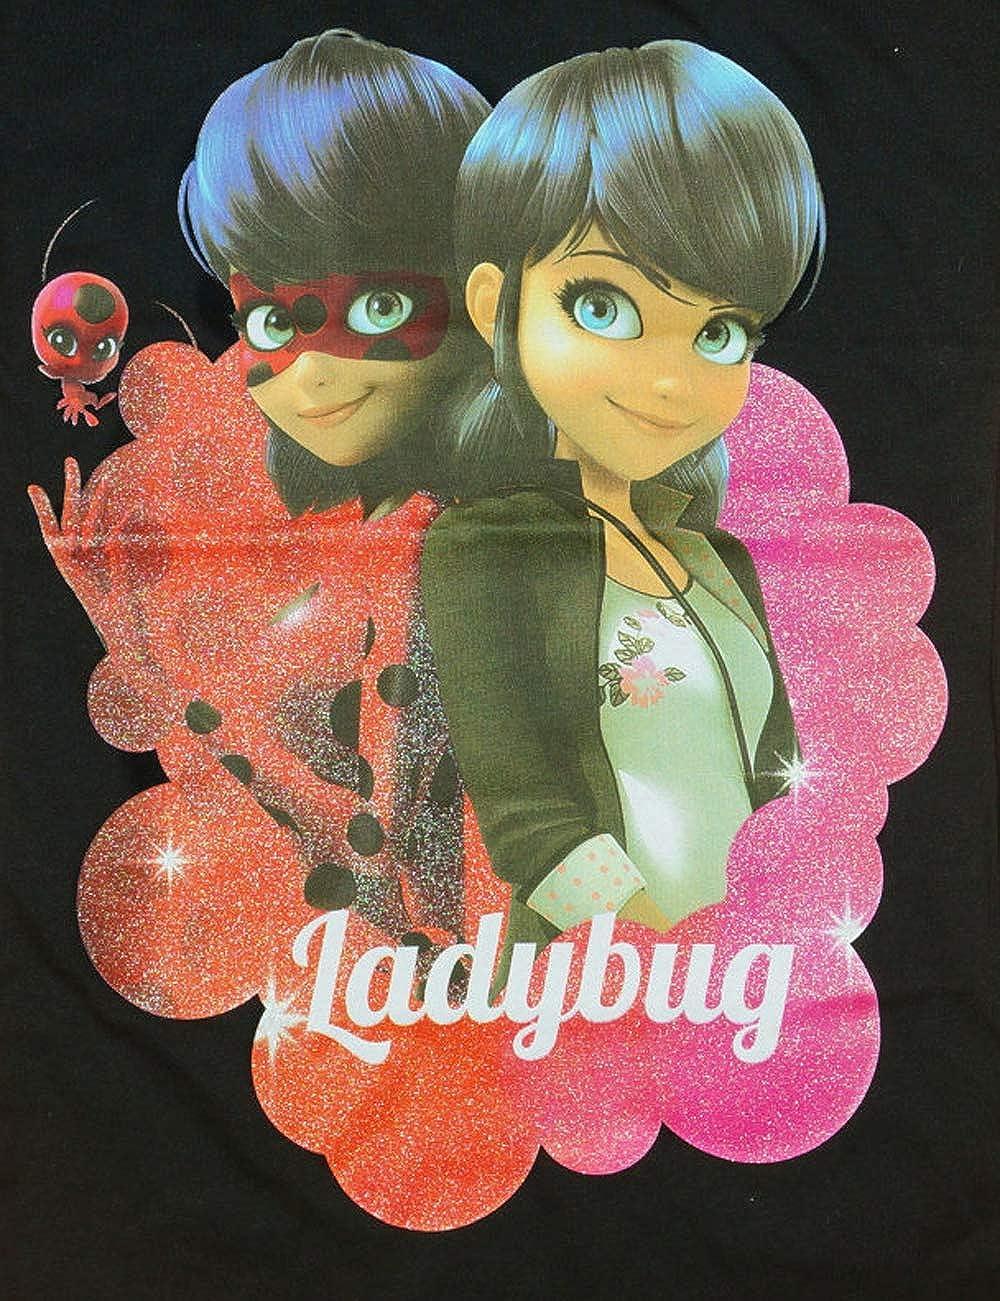 110 134 Cat Noire Disney Miraculous M/ädchen- Kurzarm-Shirt Lady-Bug T-Shirtmit s/ü/ßem Motiv 128 116 Oberteil aus Baumwolle in GR/ÖSSE 104 122 140